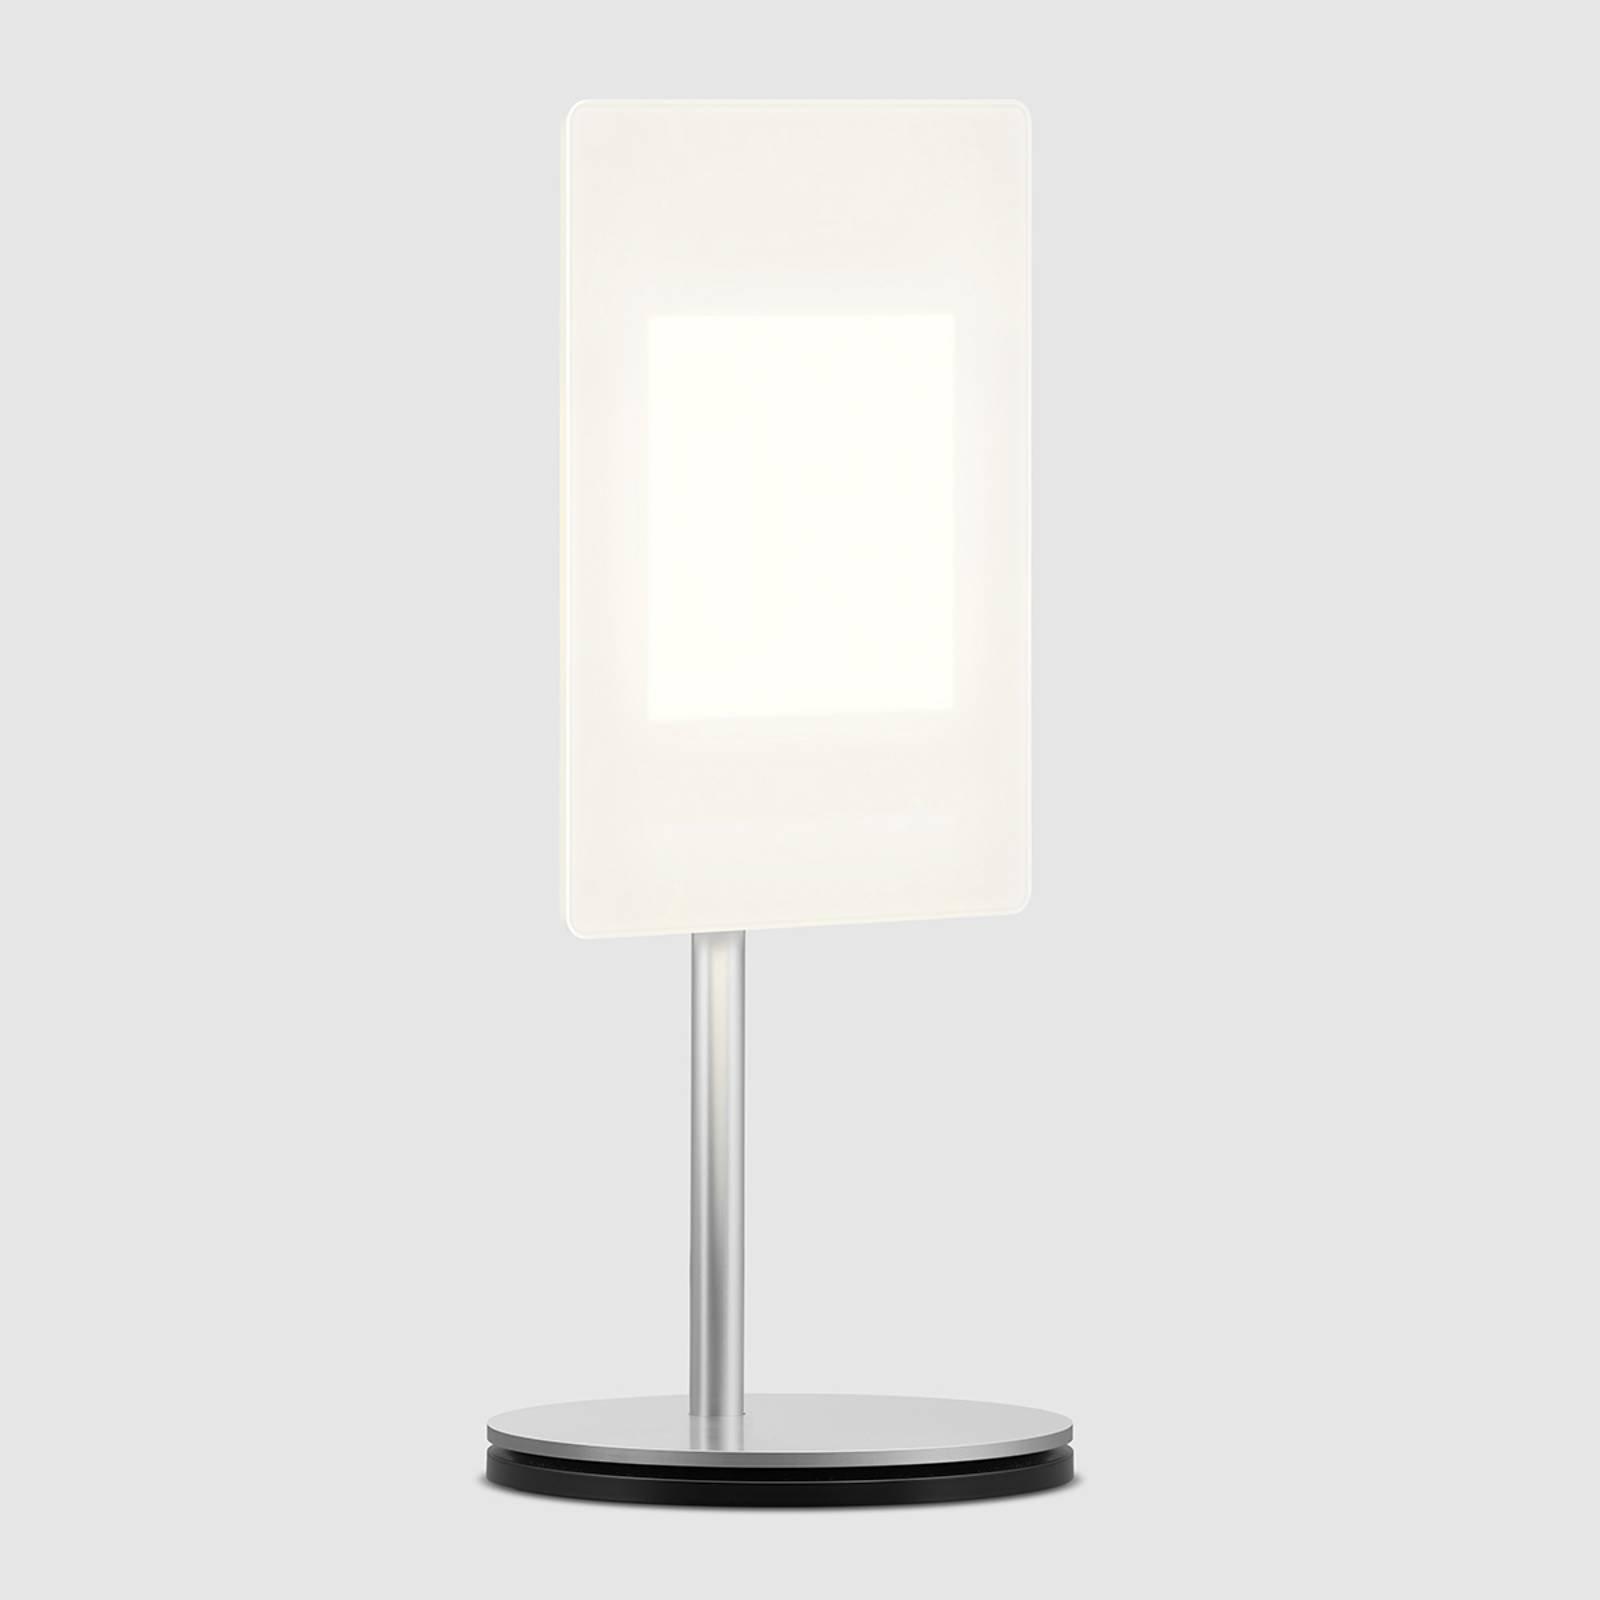 OLED-bordlampe OMLED One t1 med OLED, svart